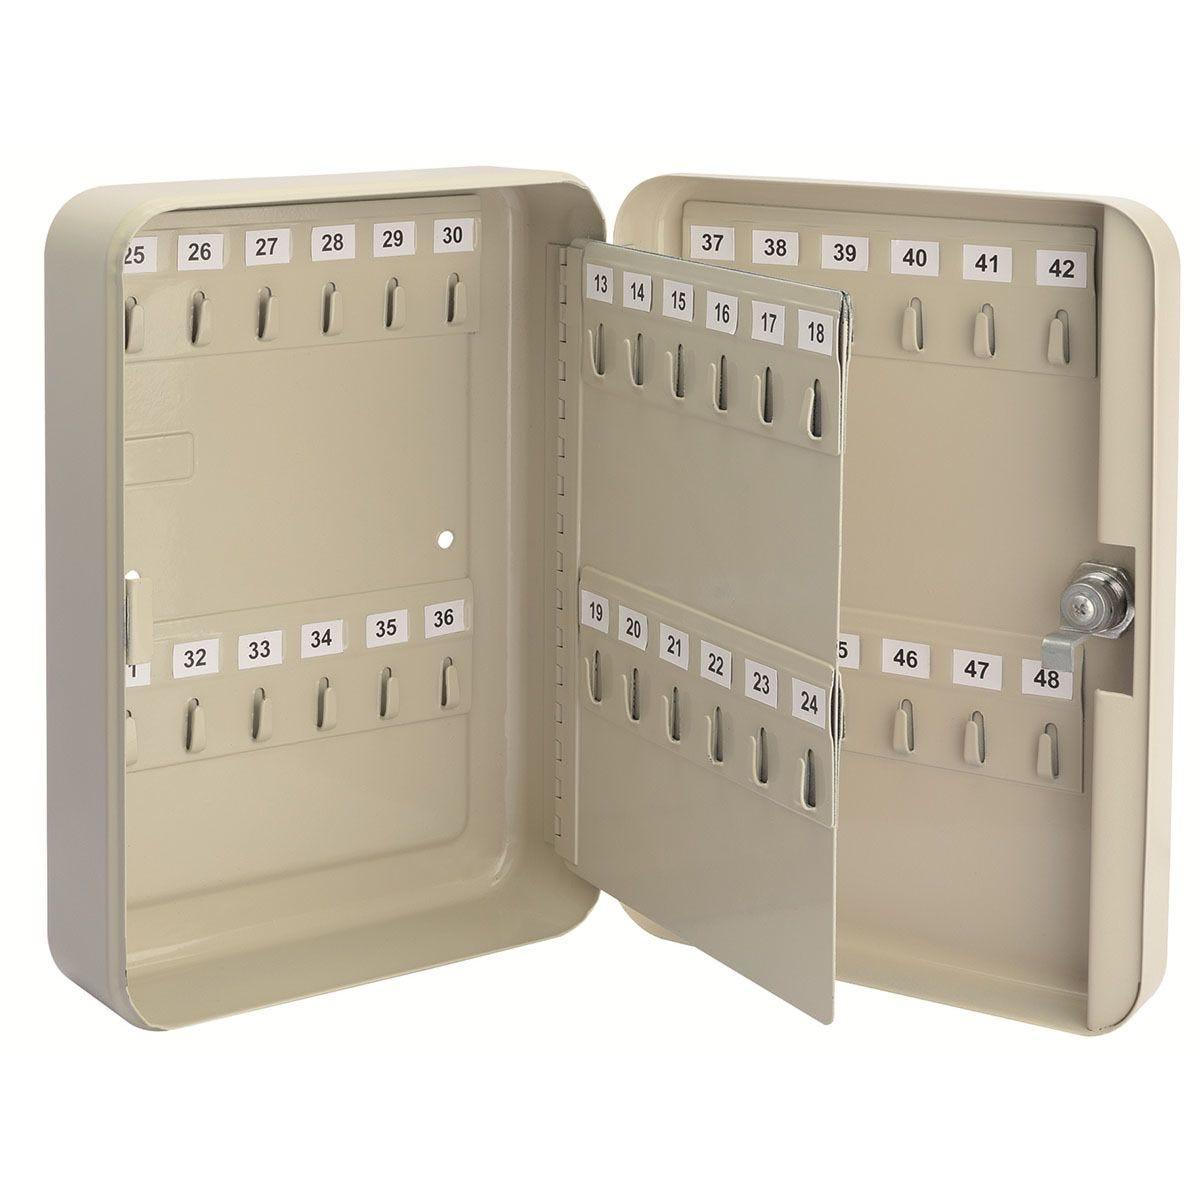 Draper 48 Hooks Key Cabinet - Cream